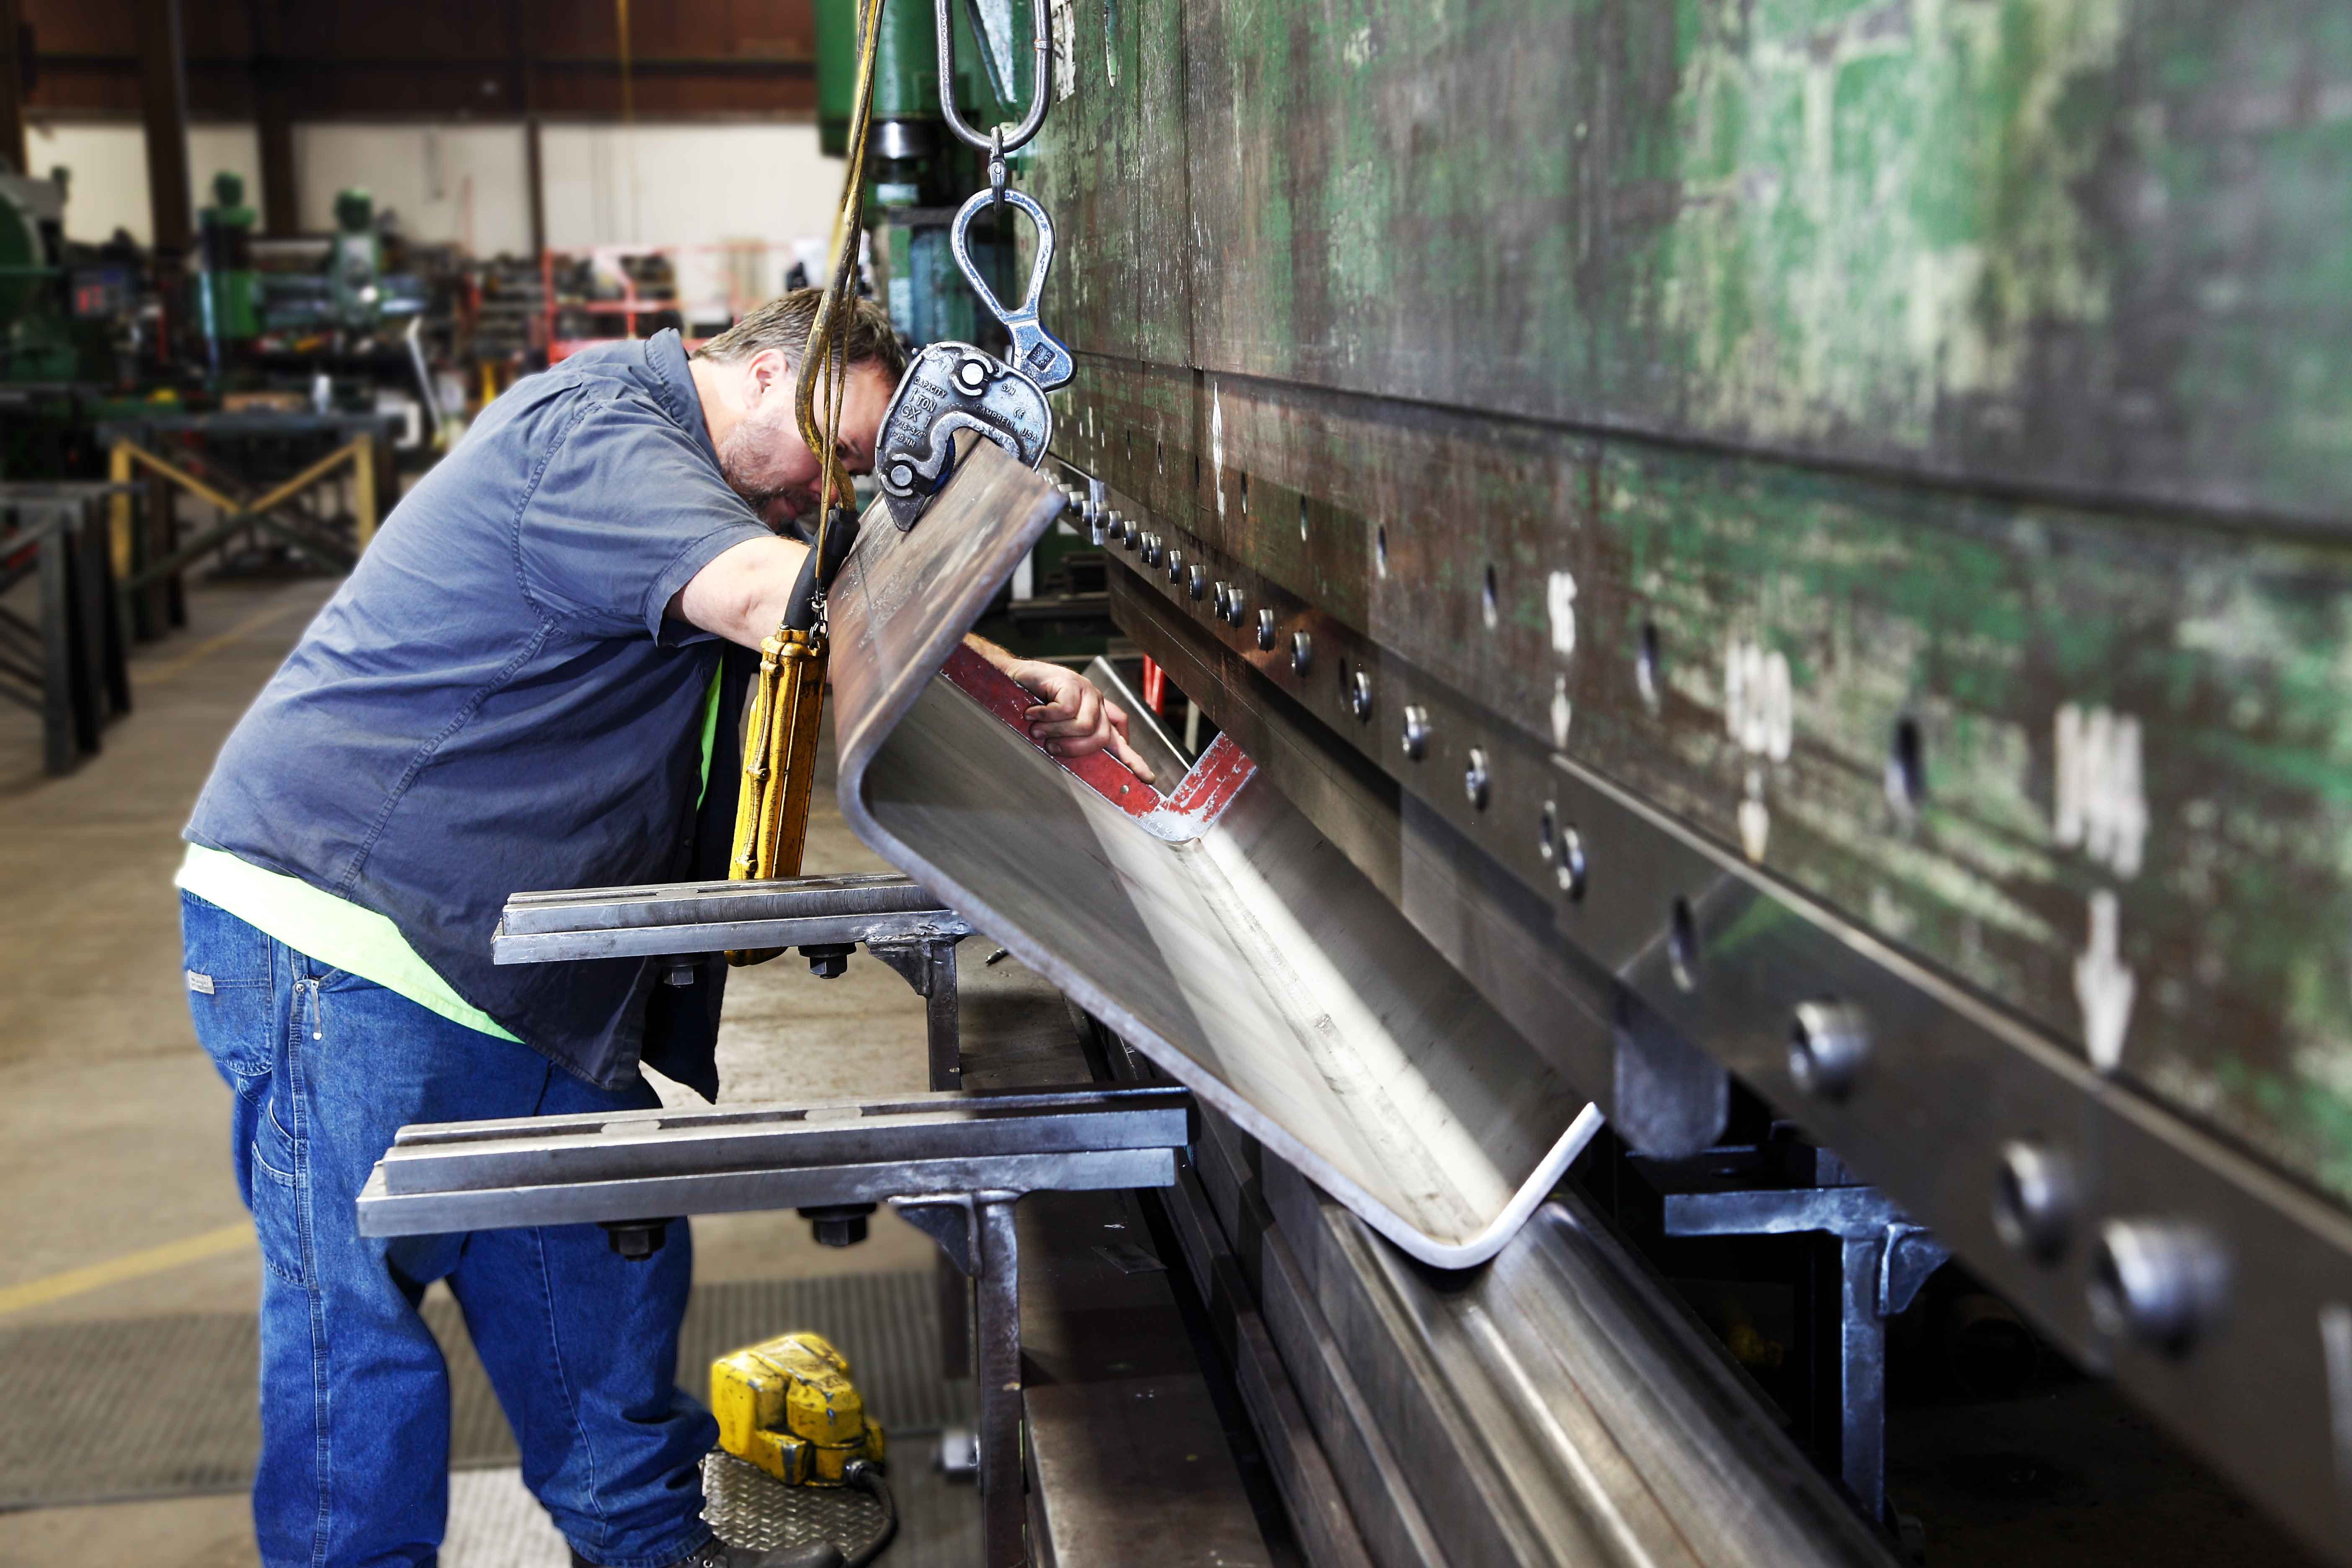 Steel Products Manufacturing : Press brake for custom metal fabrication at heintz steel